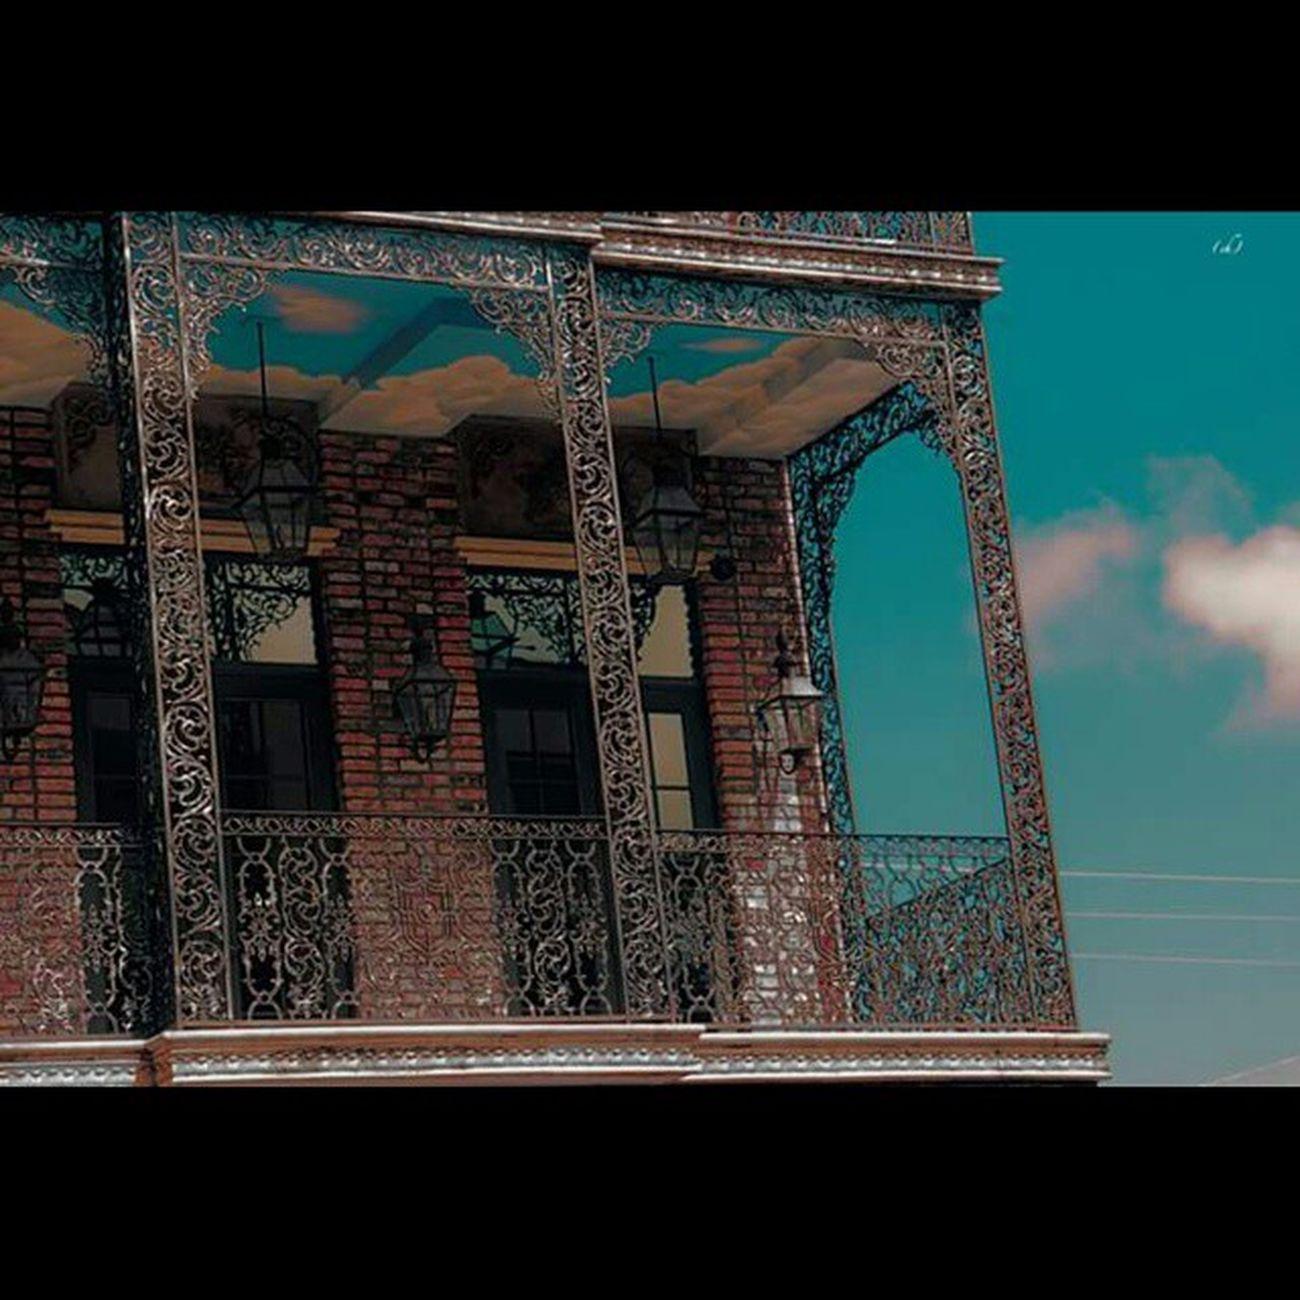 Nuage Nuage Cloud Roof Plafond CoconutGrove Miami Florida Floride Balcon Art Peint Peinture Architecture Melange Melt Sky Blue Bluesky CielBleu Arc Arcade